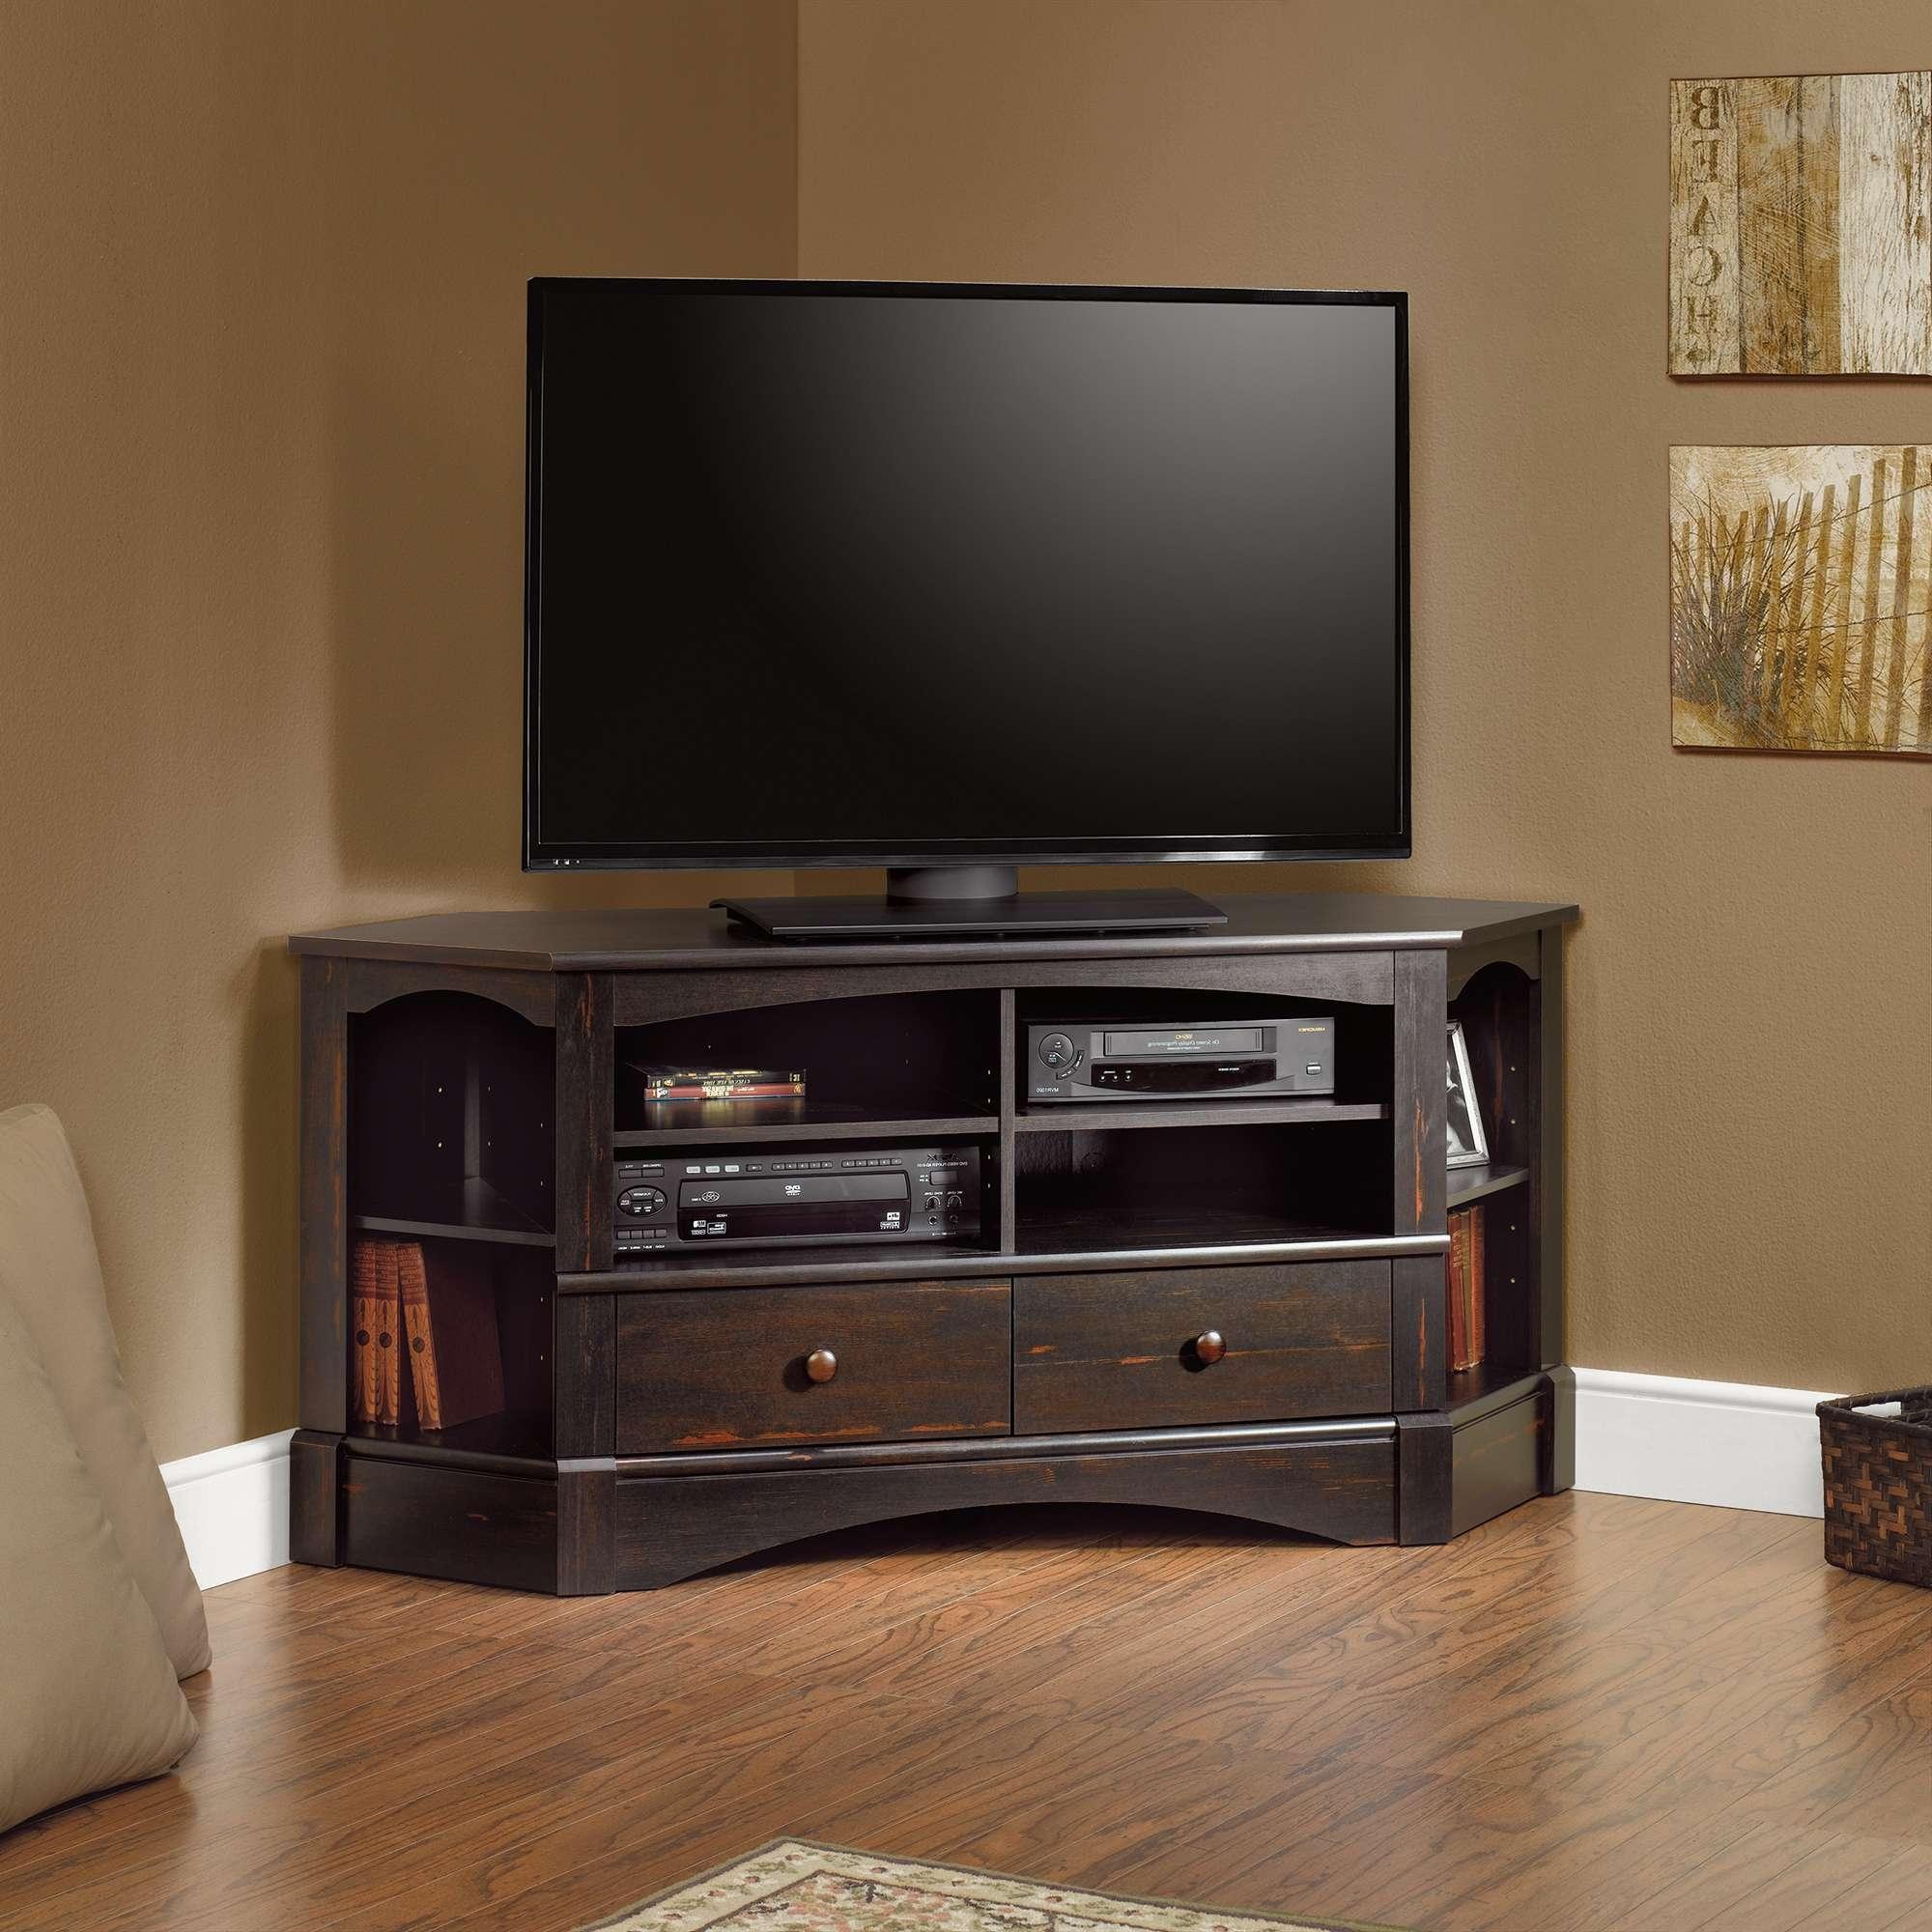 Fancy Matte Varnished Dark Oak Wood Tall Corner Tv Stand For Regarding Fancy Tv Stands (View 10 of 15)